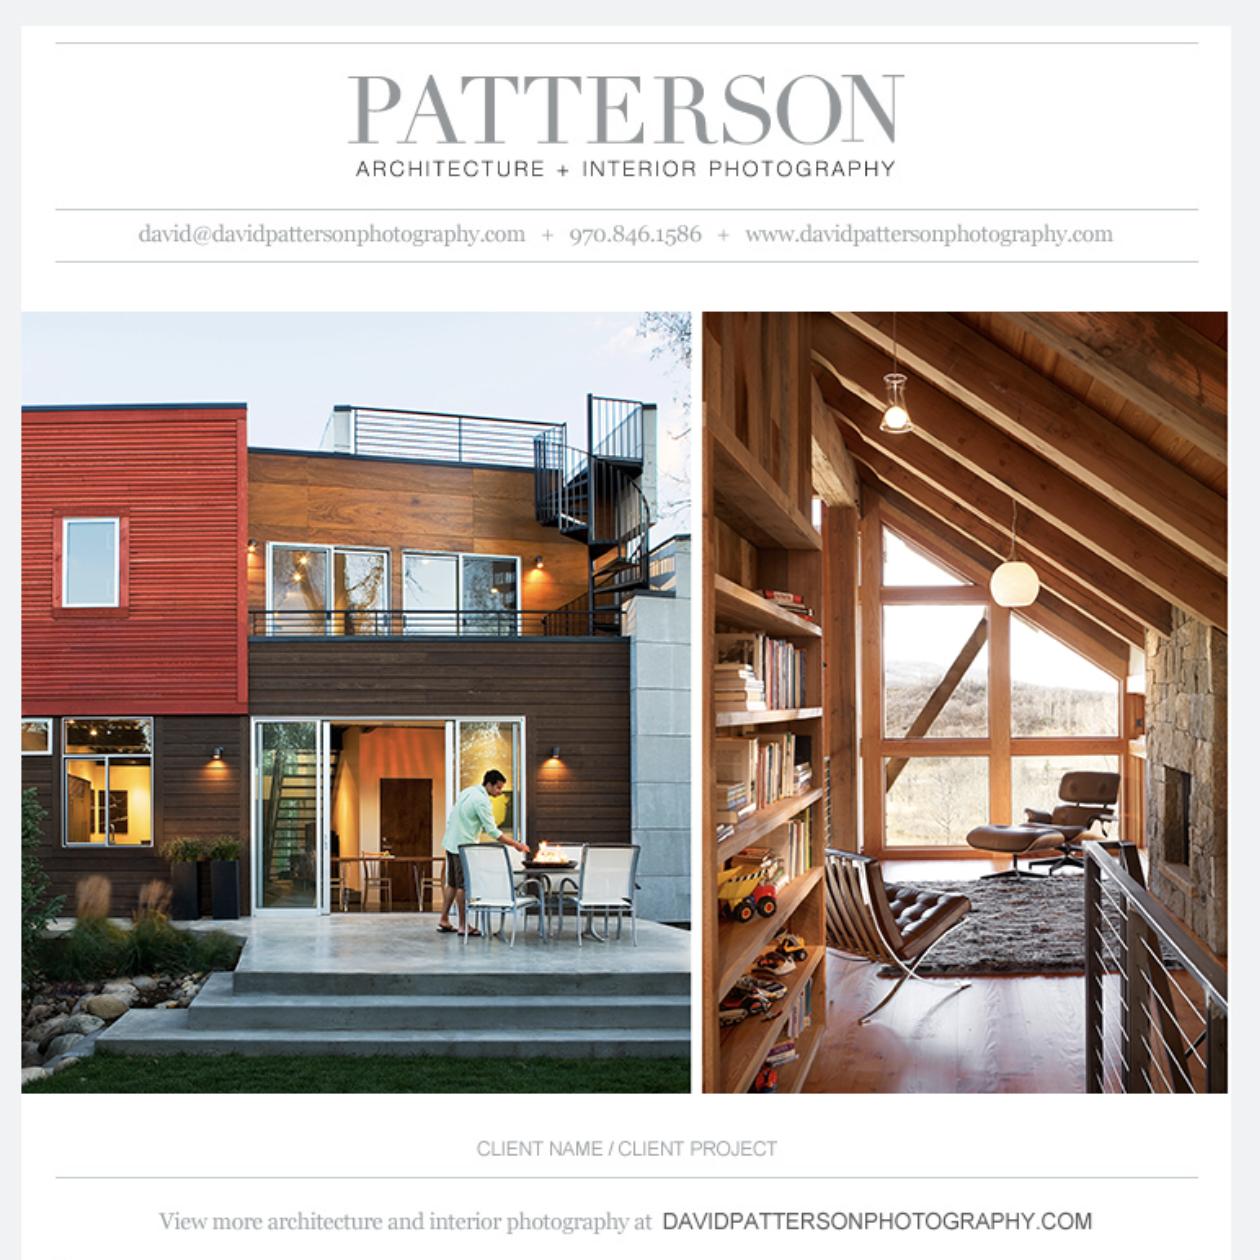 Design: Updating David Patterson